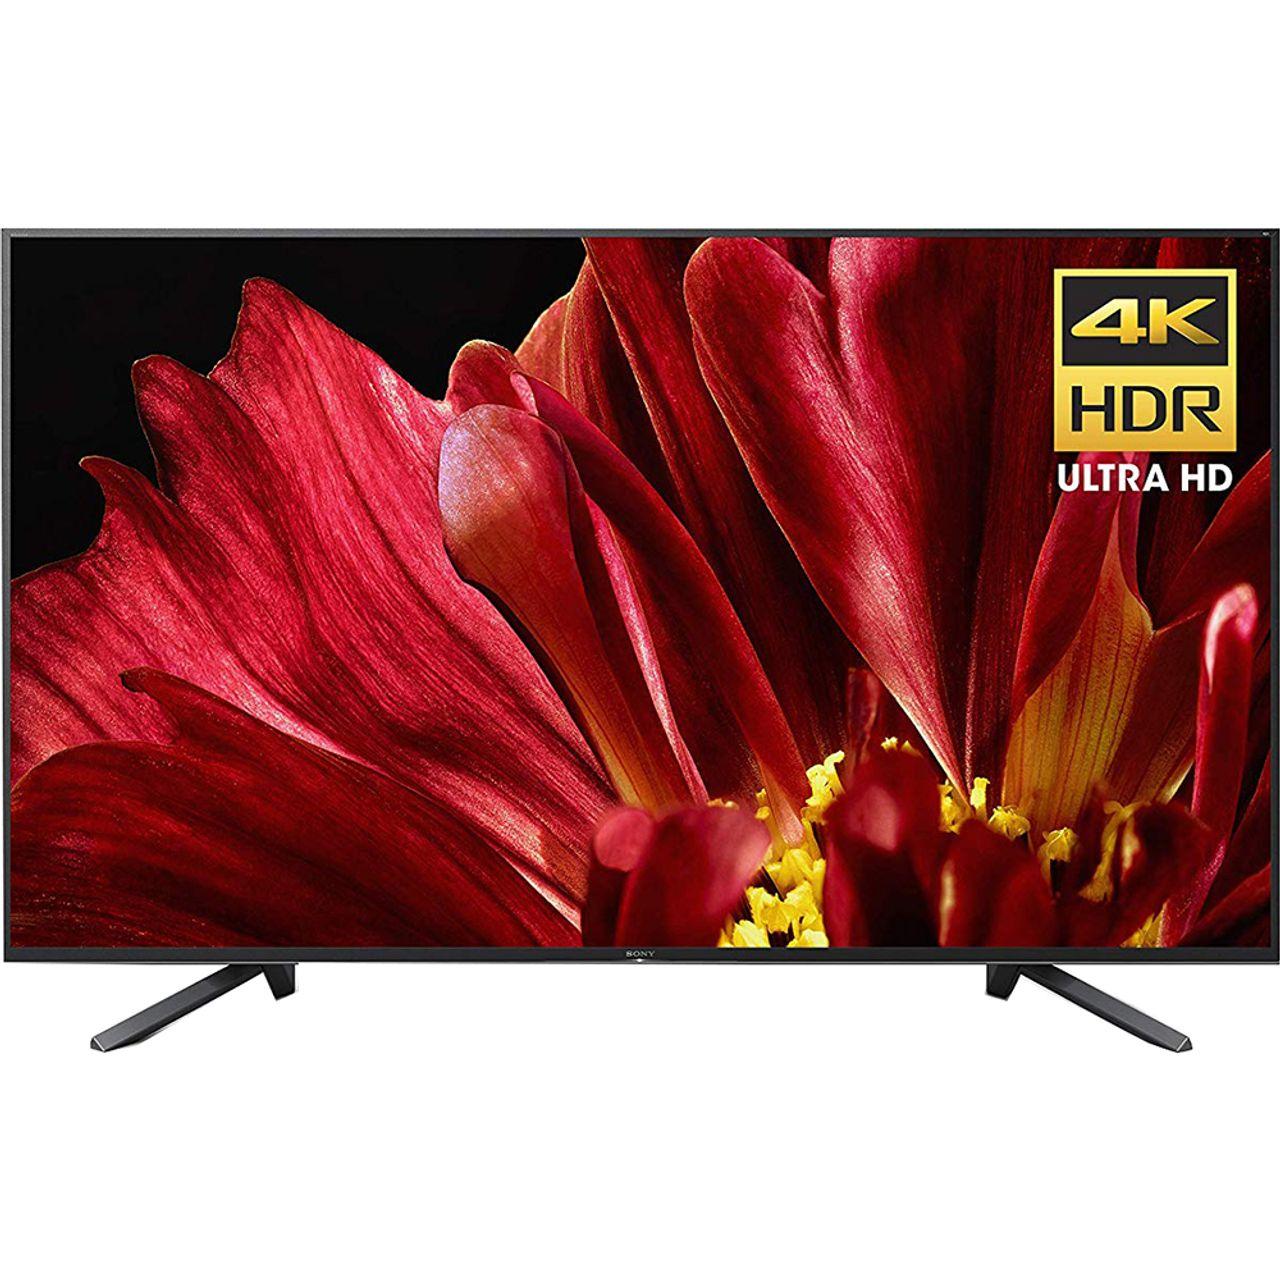 "Sony 65"" 4K Ultra HD Smart BRAVIA LED TV (2018 Model) XBR65Z9F – $1499 + Free Shipping"